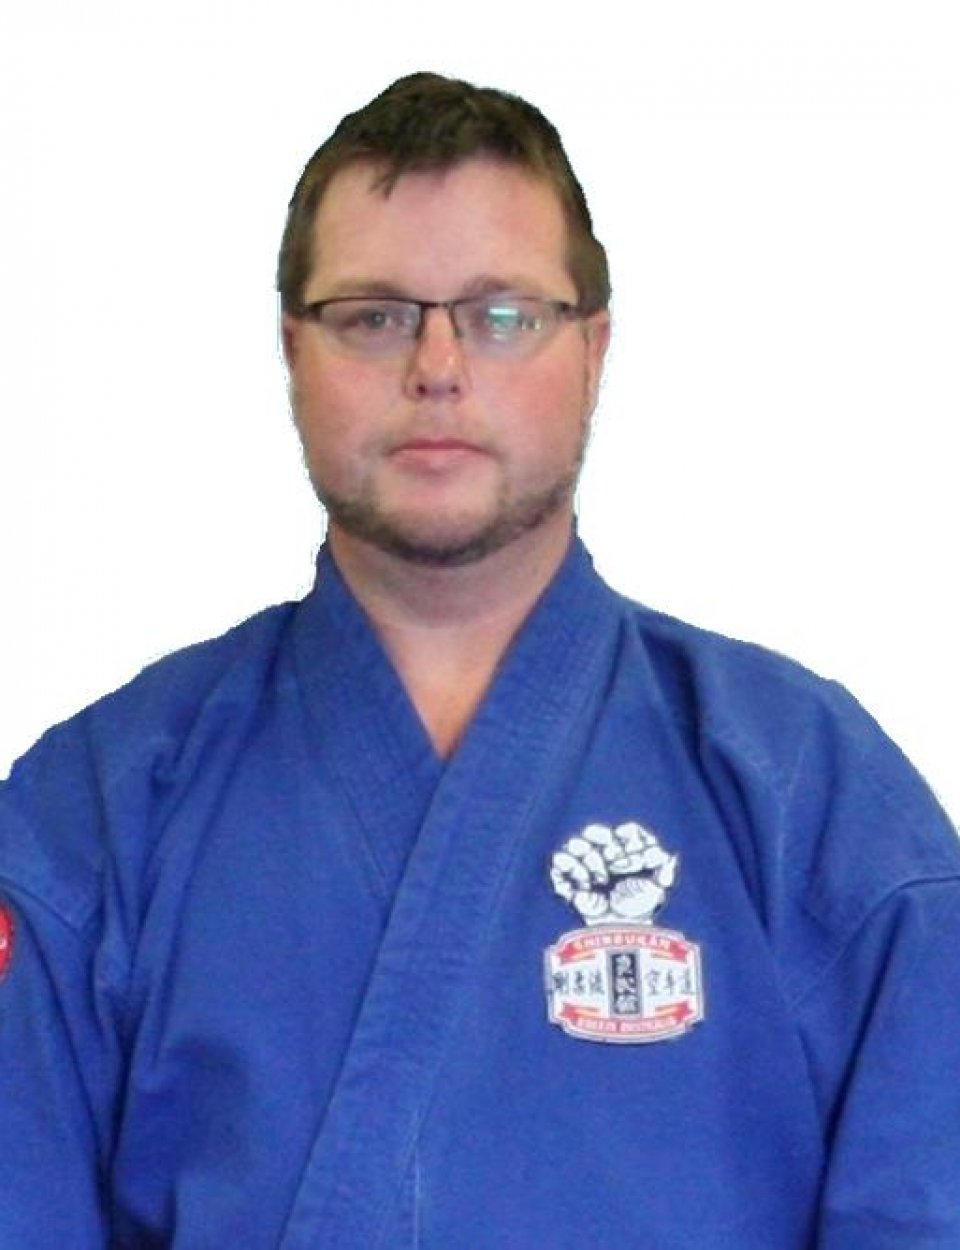 Craig Crampton Shihan